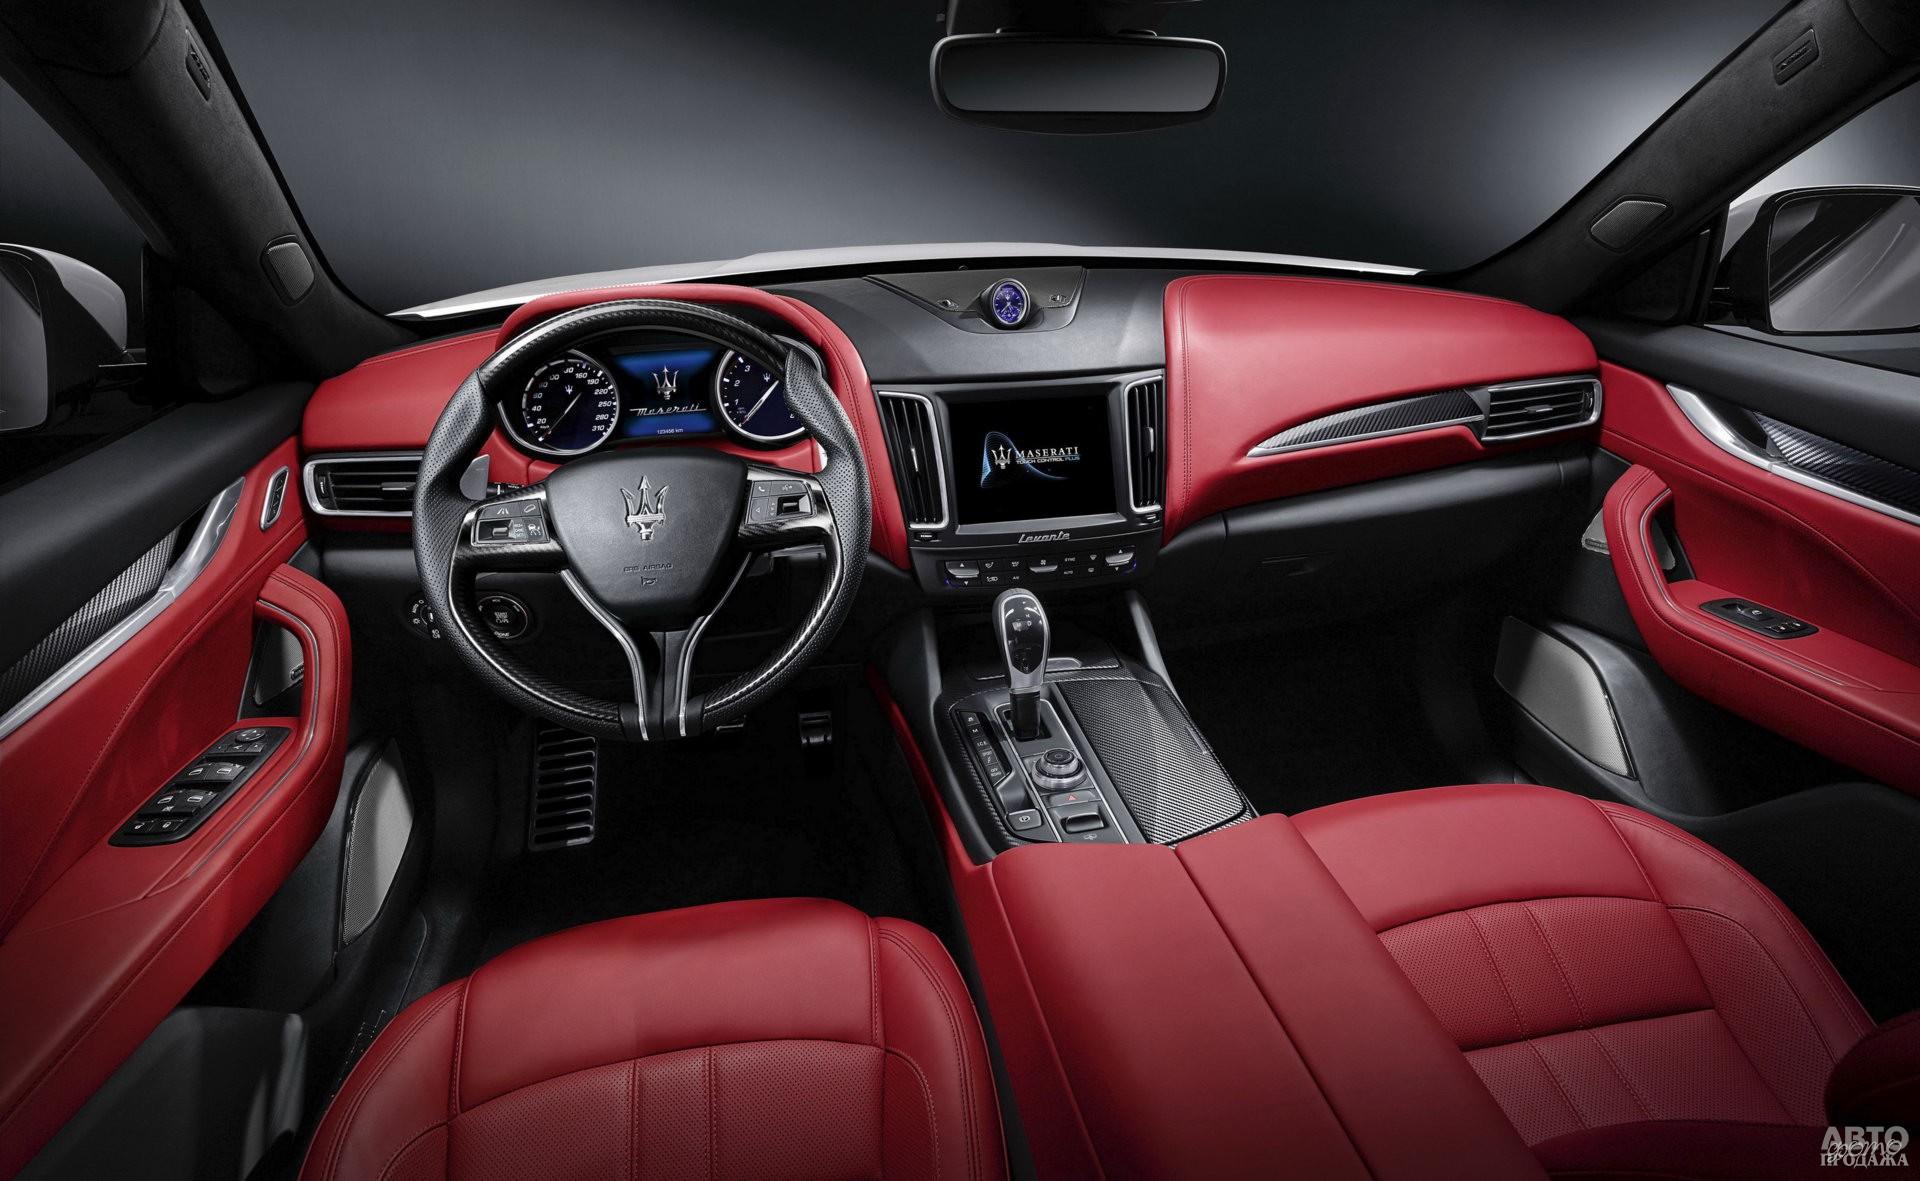 На центральной панели Maserati установлен циферблат часов